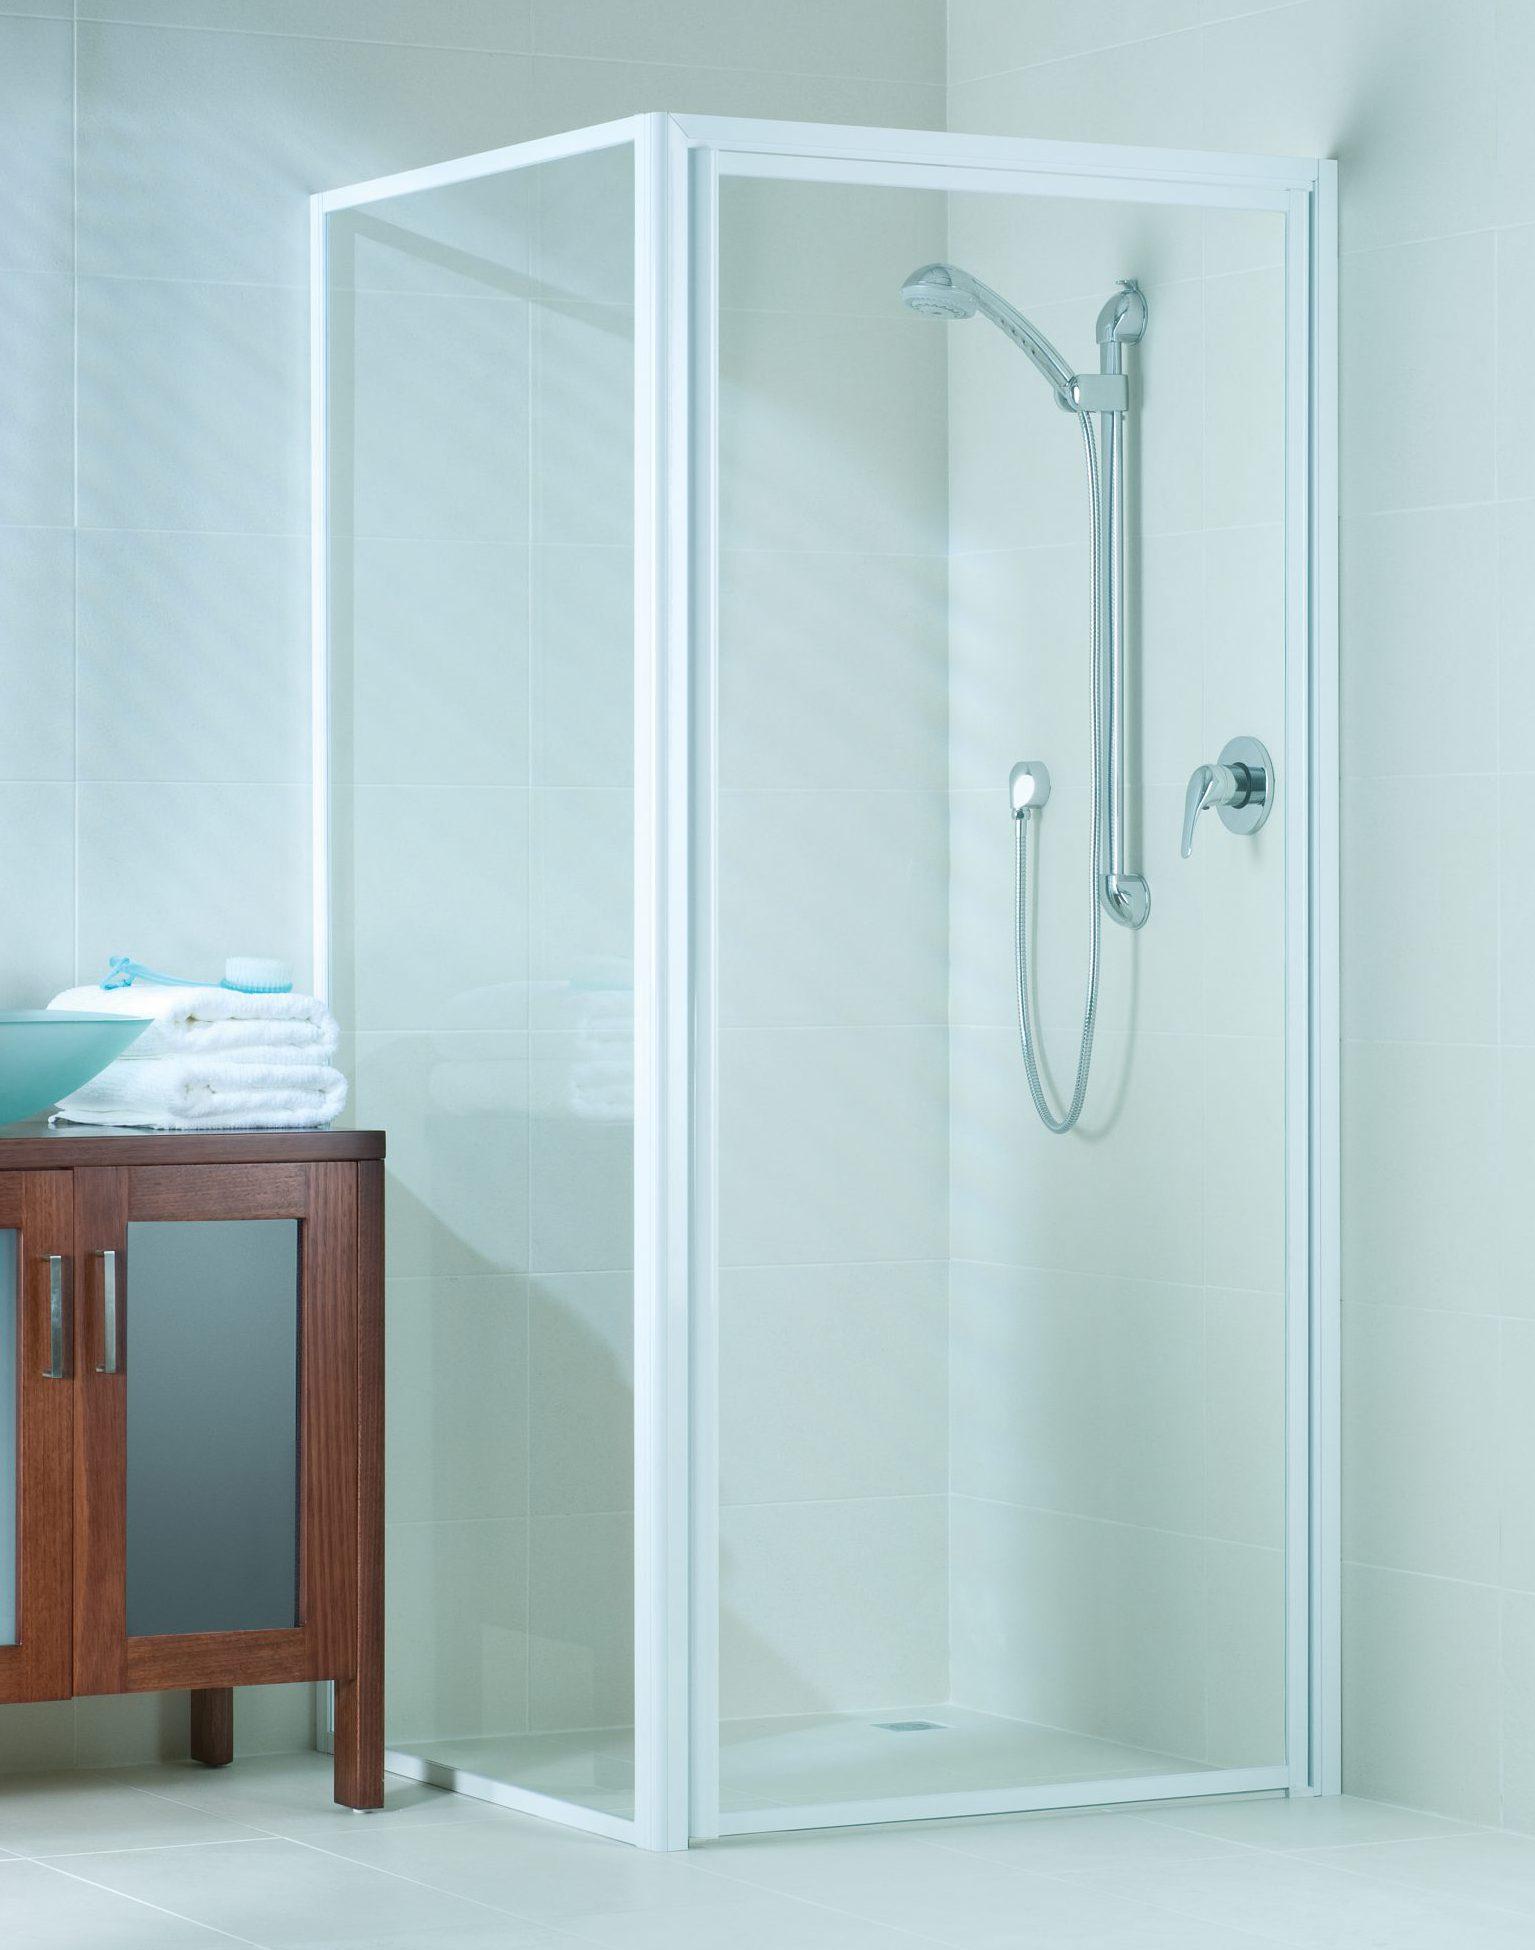 Phoenix Sill-less shower screens